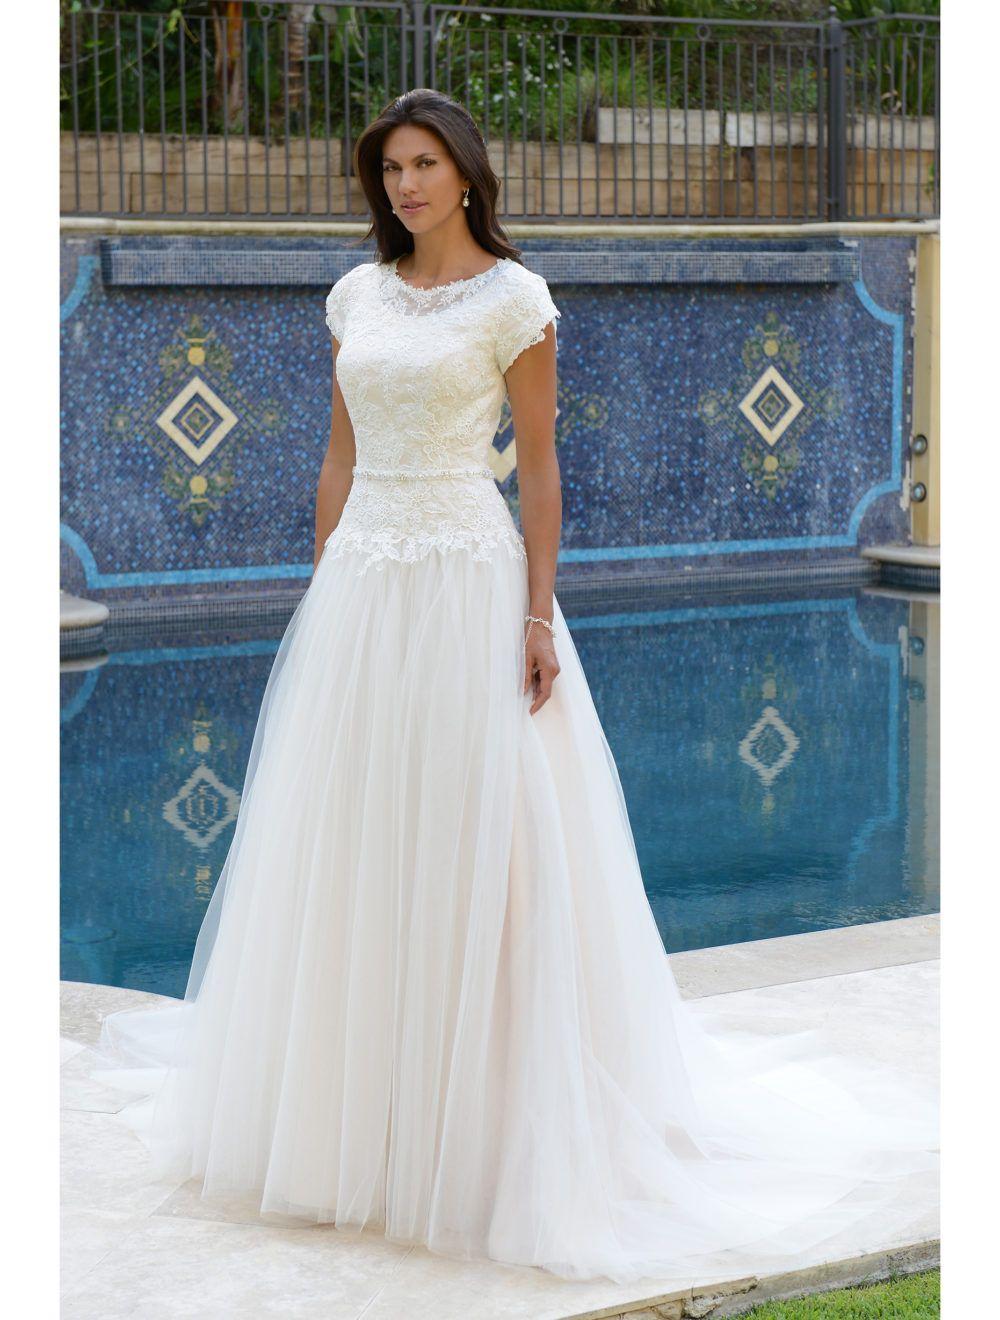 Großhandel 2018 New Lace Tüll Modest Brautkleider mit Blütenblatt ...